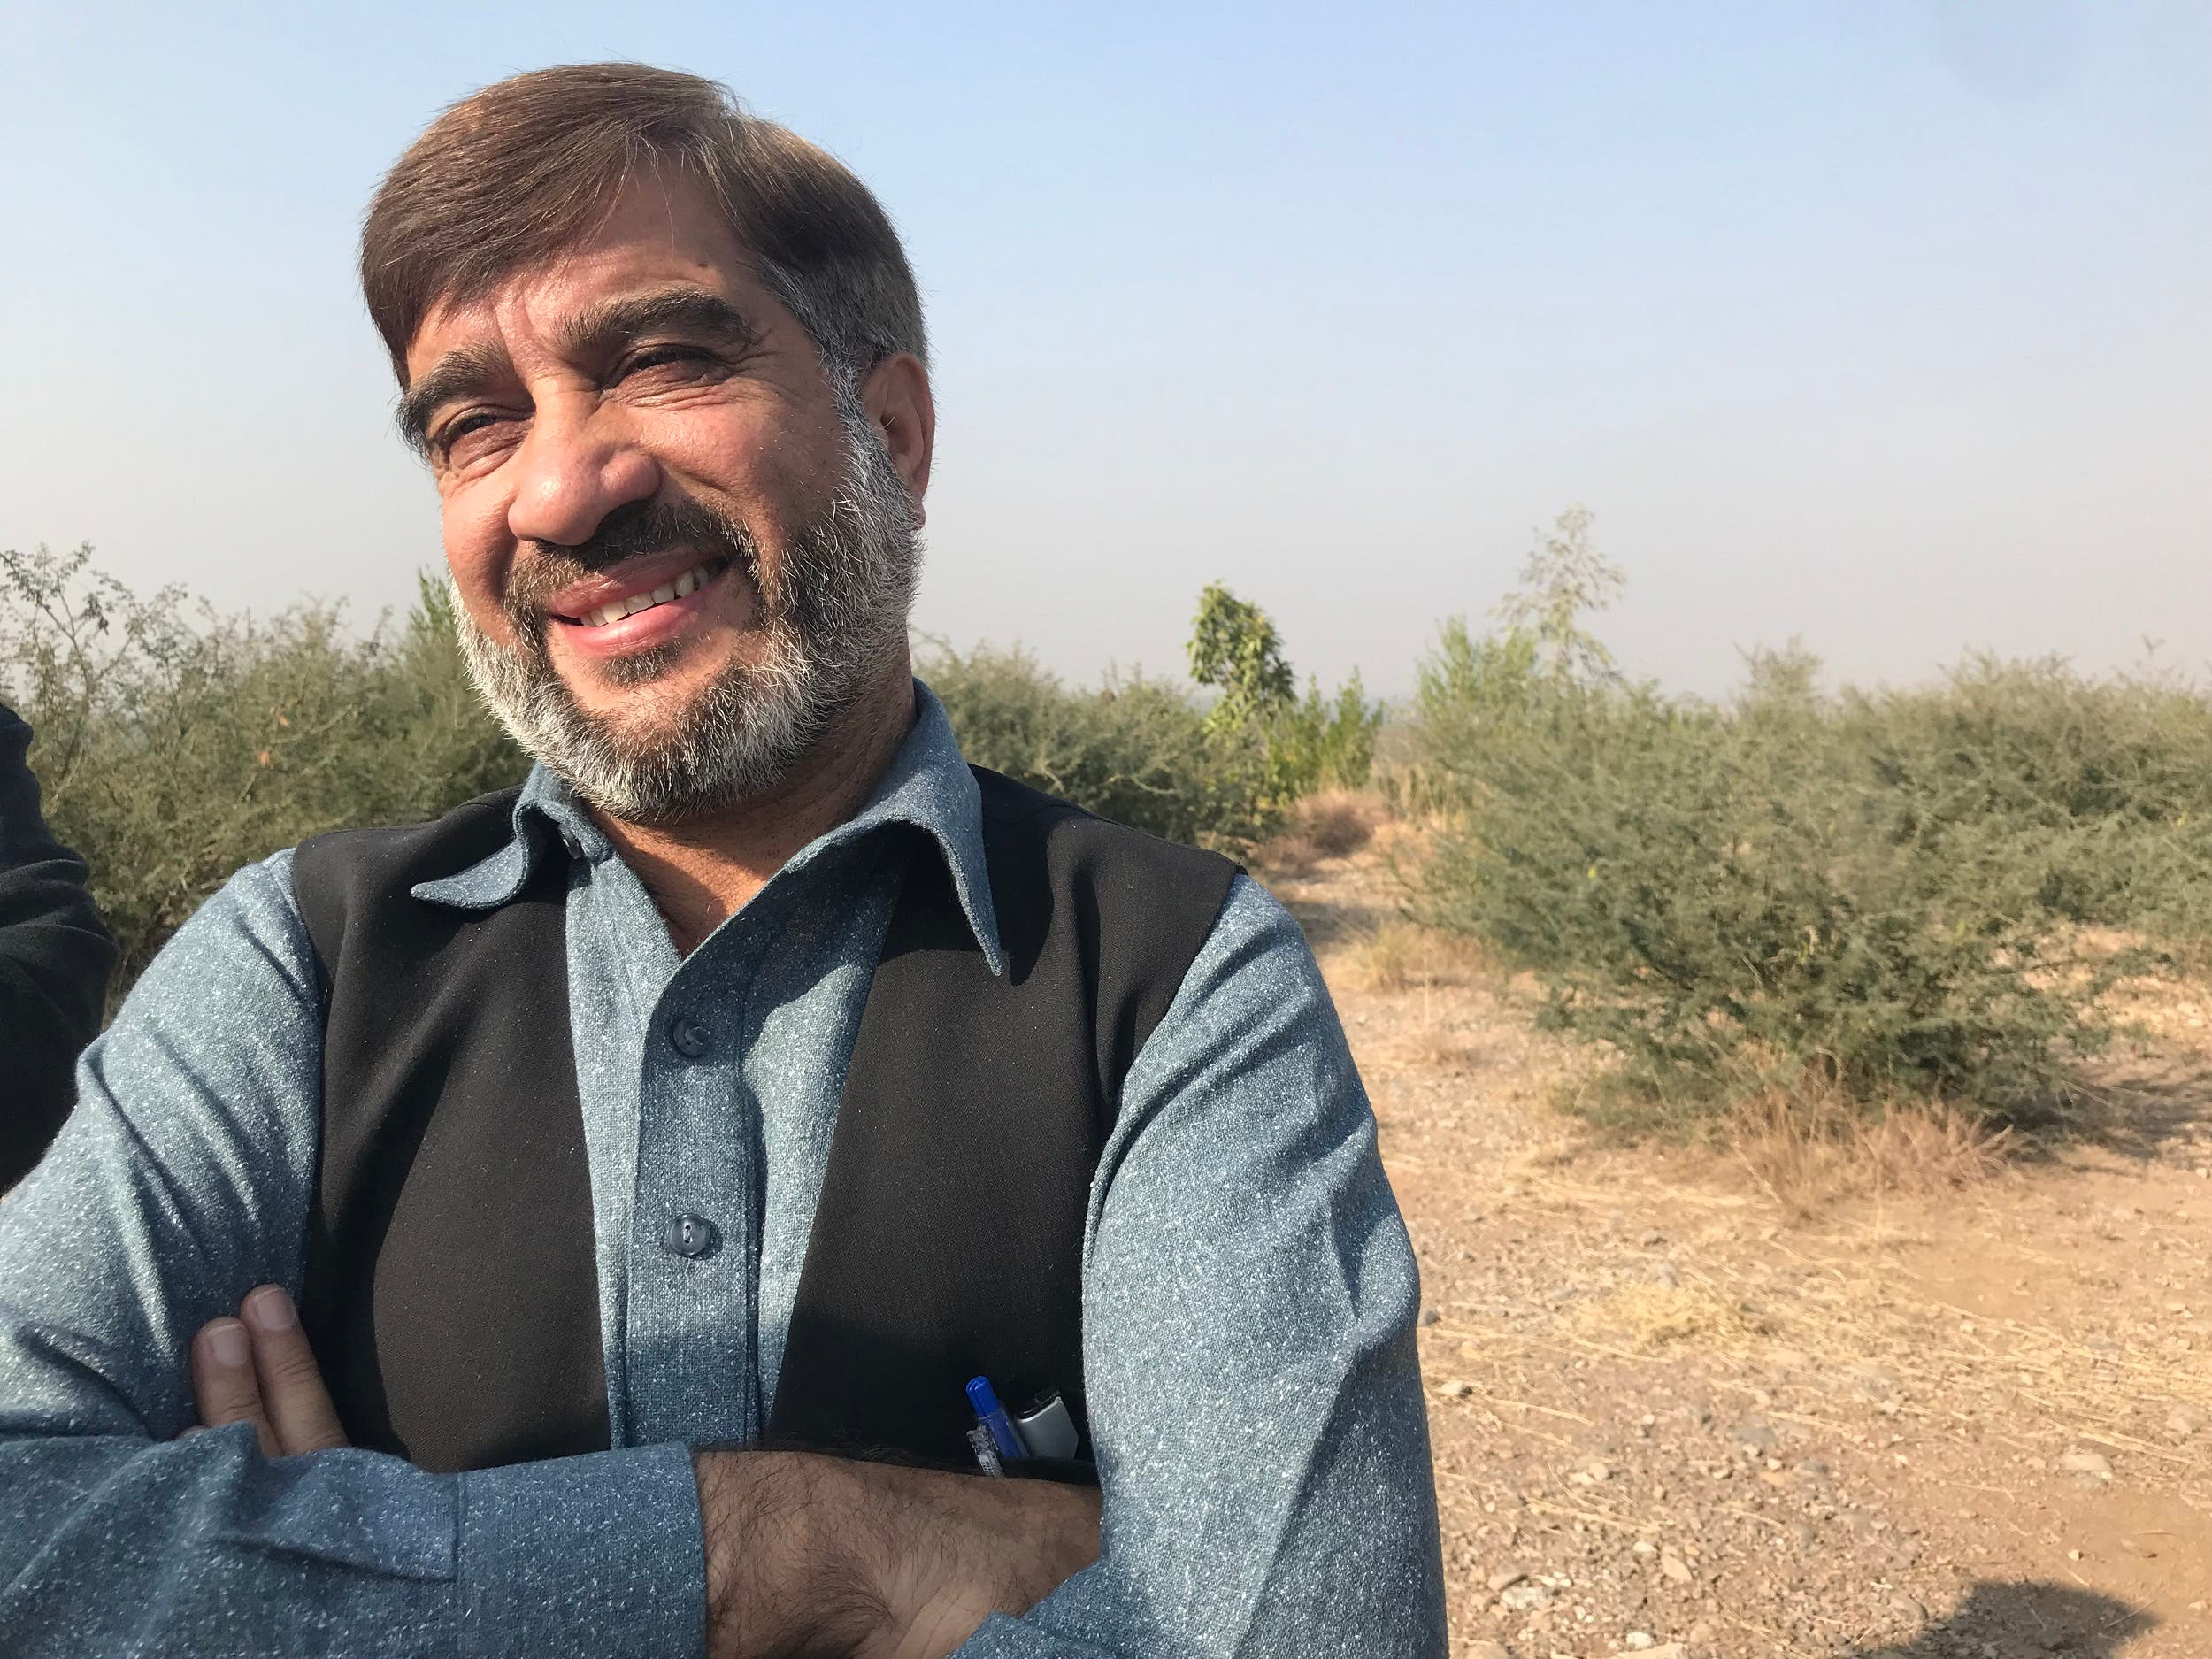 Muhammad Tehmasip, Projector Billion Tree Afforestation Project at Garhi Chandan near Peshawar. (Supplied)